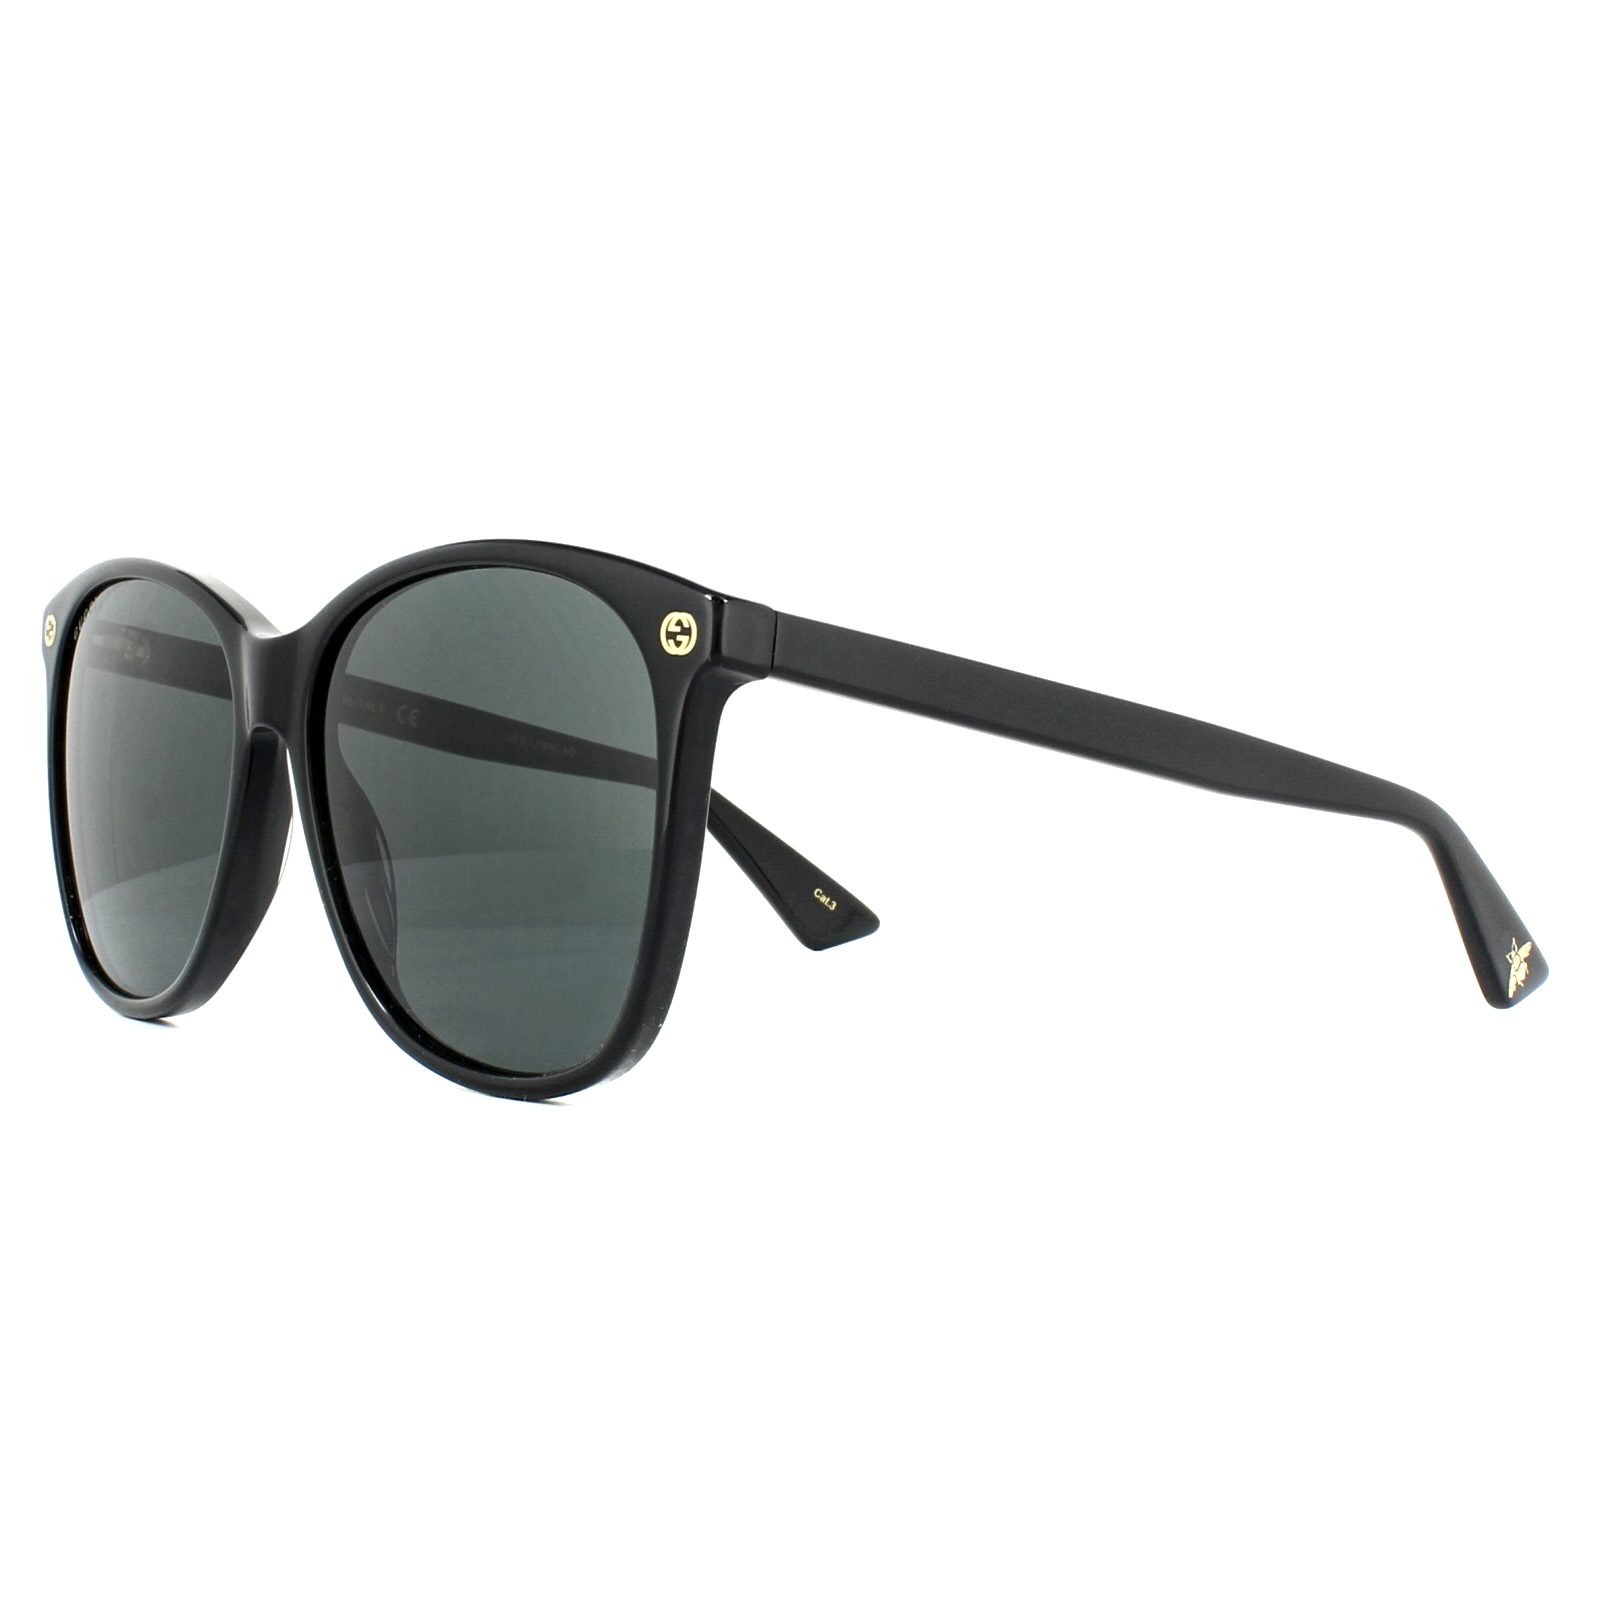 171fffc206 Sentinel Gucci Sunglasses GG0024S 001 Black Grey